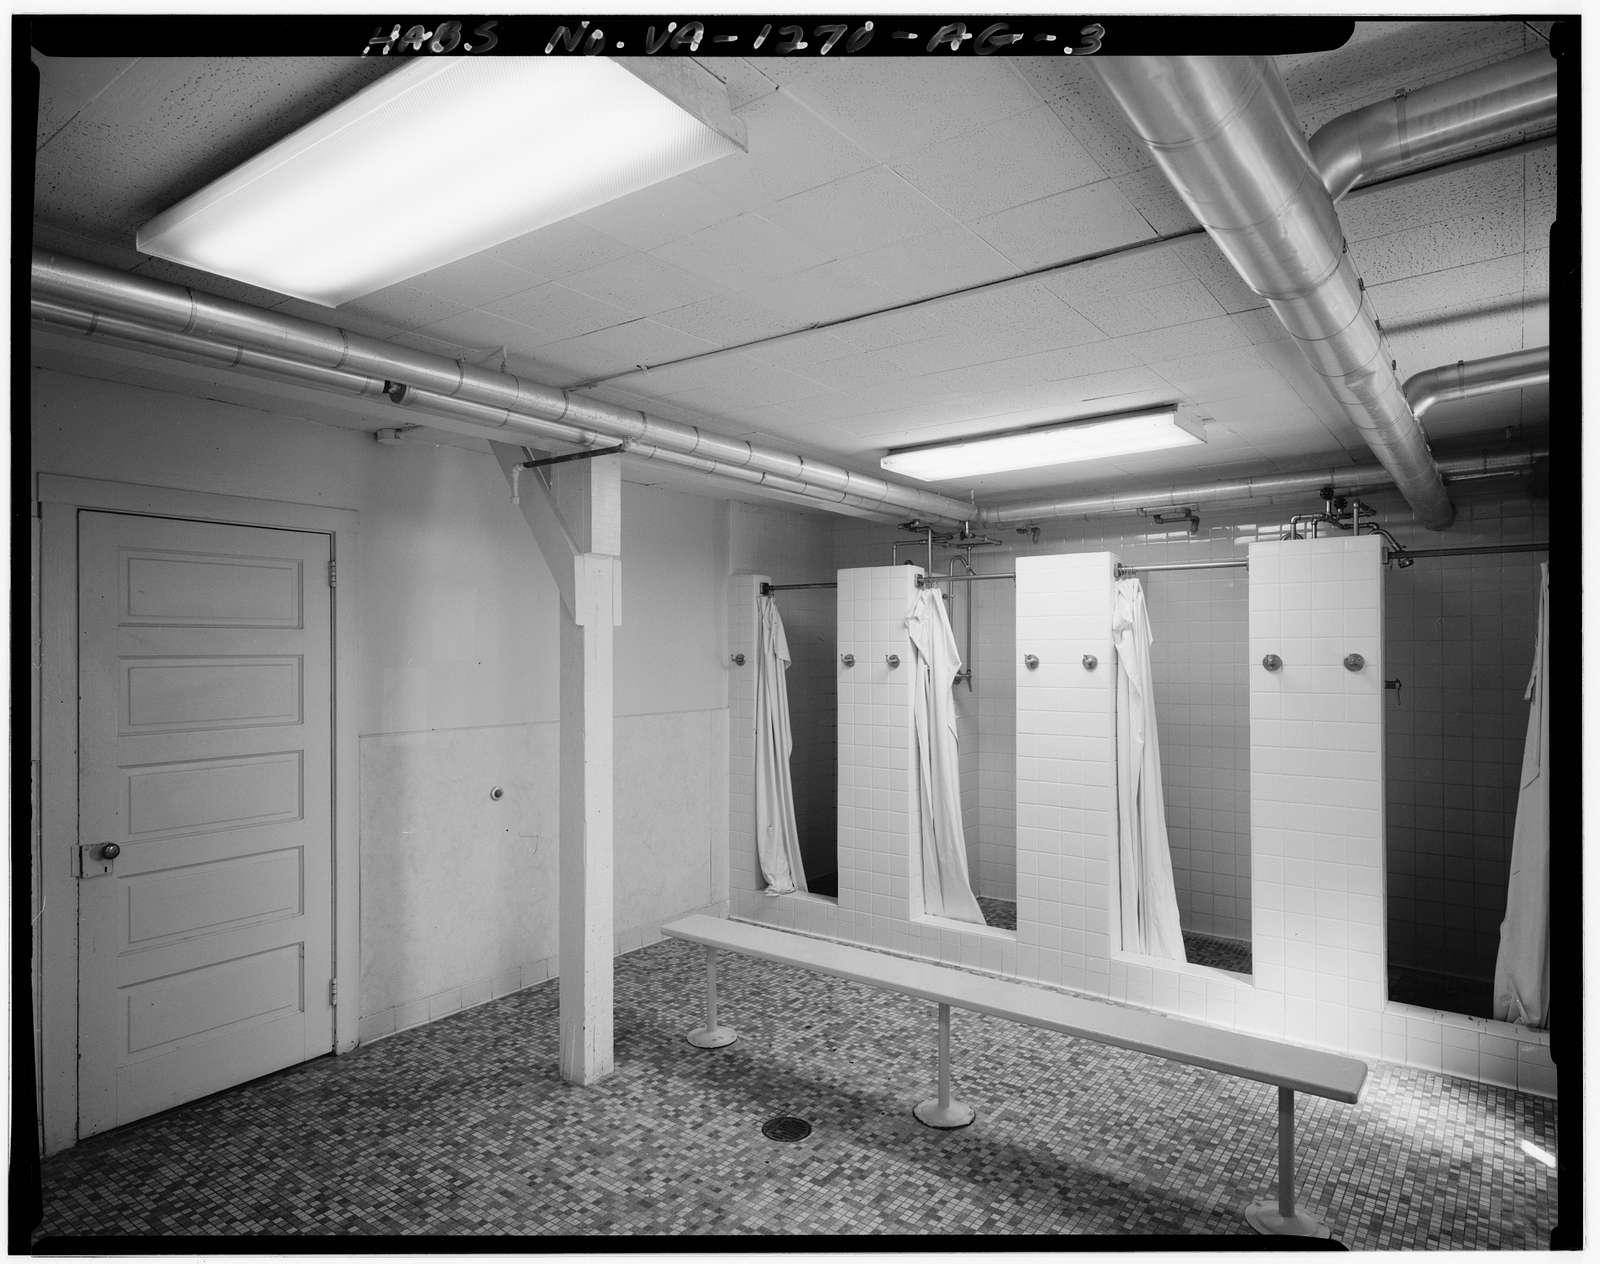 Arlington Hall Station, Building No. 508, 4000 Arlington Boulevard, Arlington, Arlington County, VA